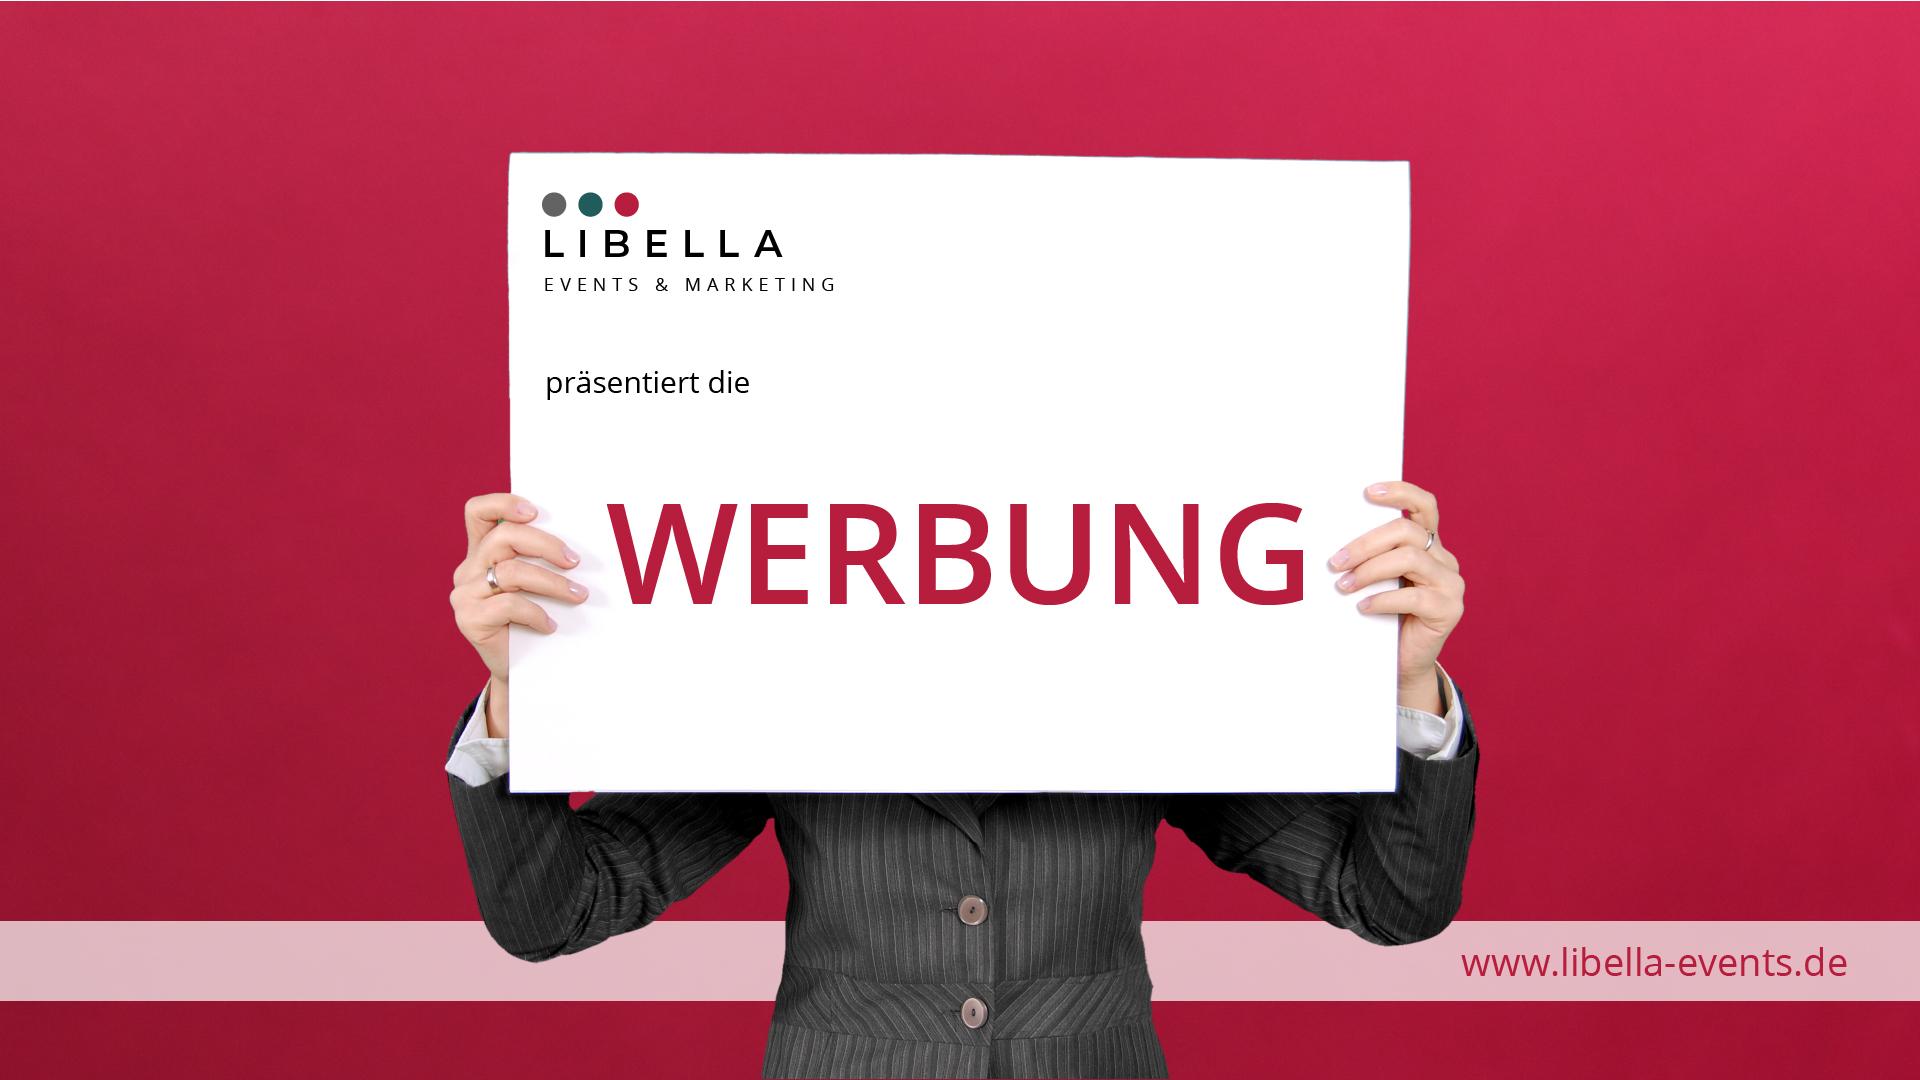 Libella Events & Marketing präsentiert Bildschirmwerbung